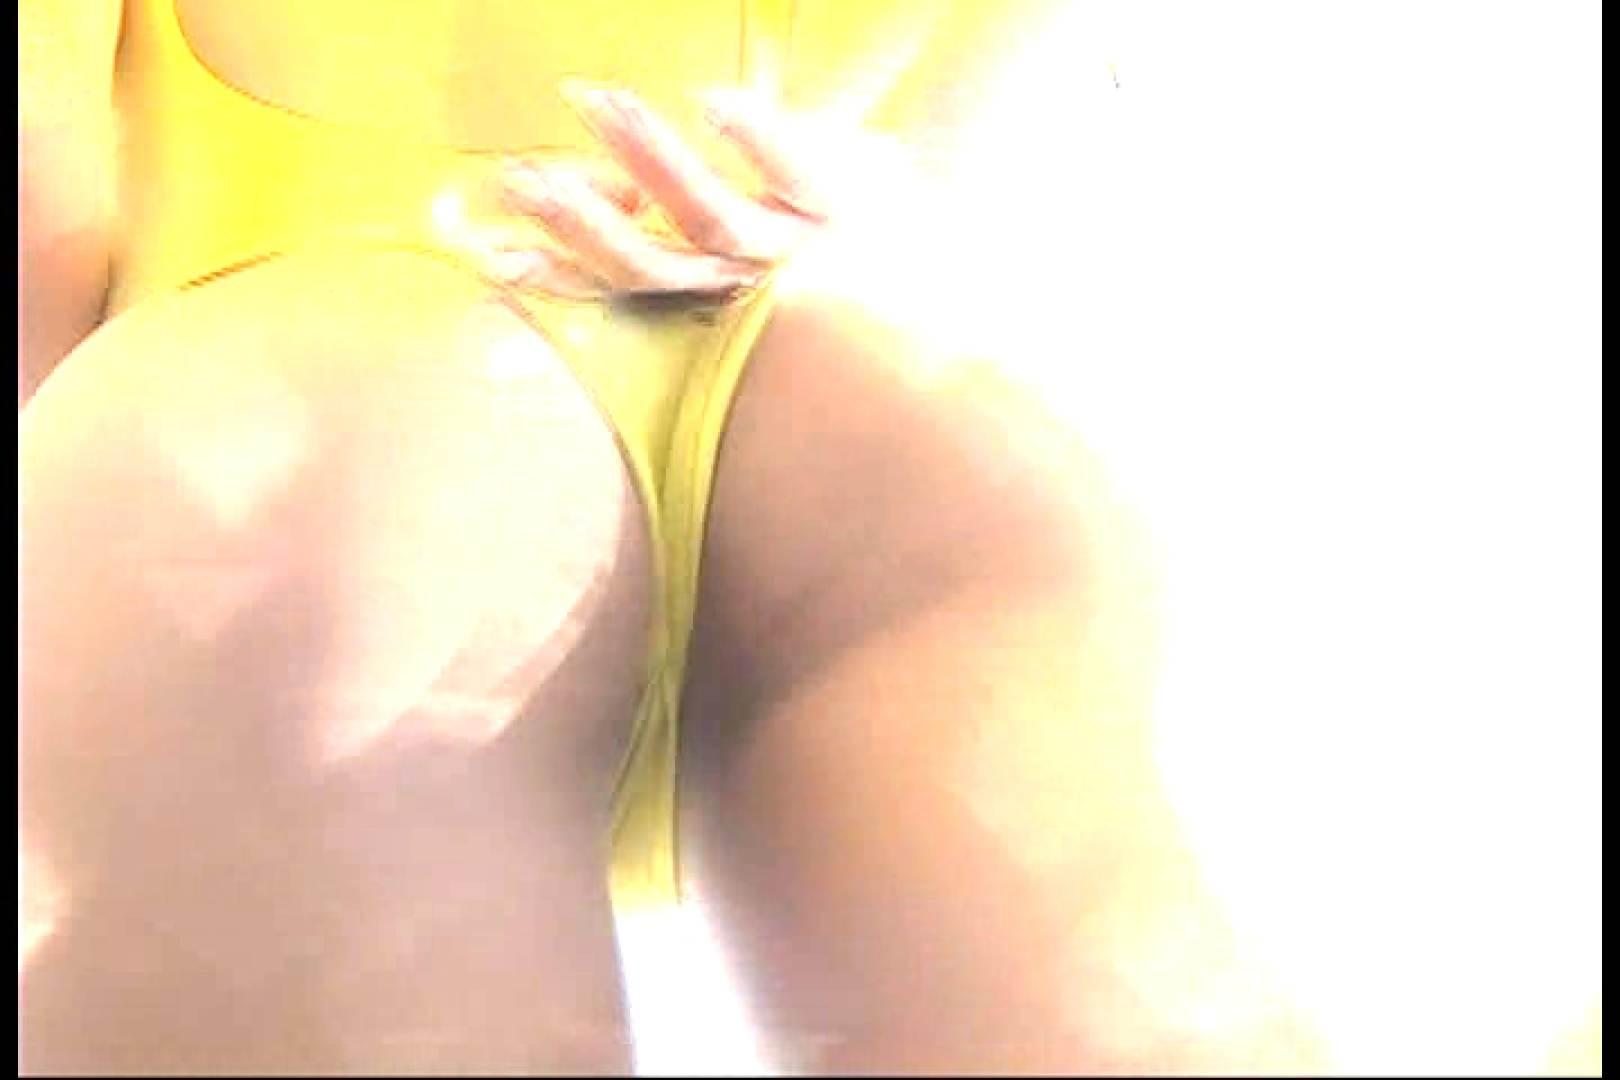 RQカメラ地獄Vol.8 美女OL   レースクイーン  84連発 83